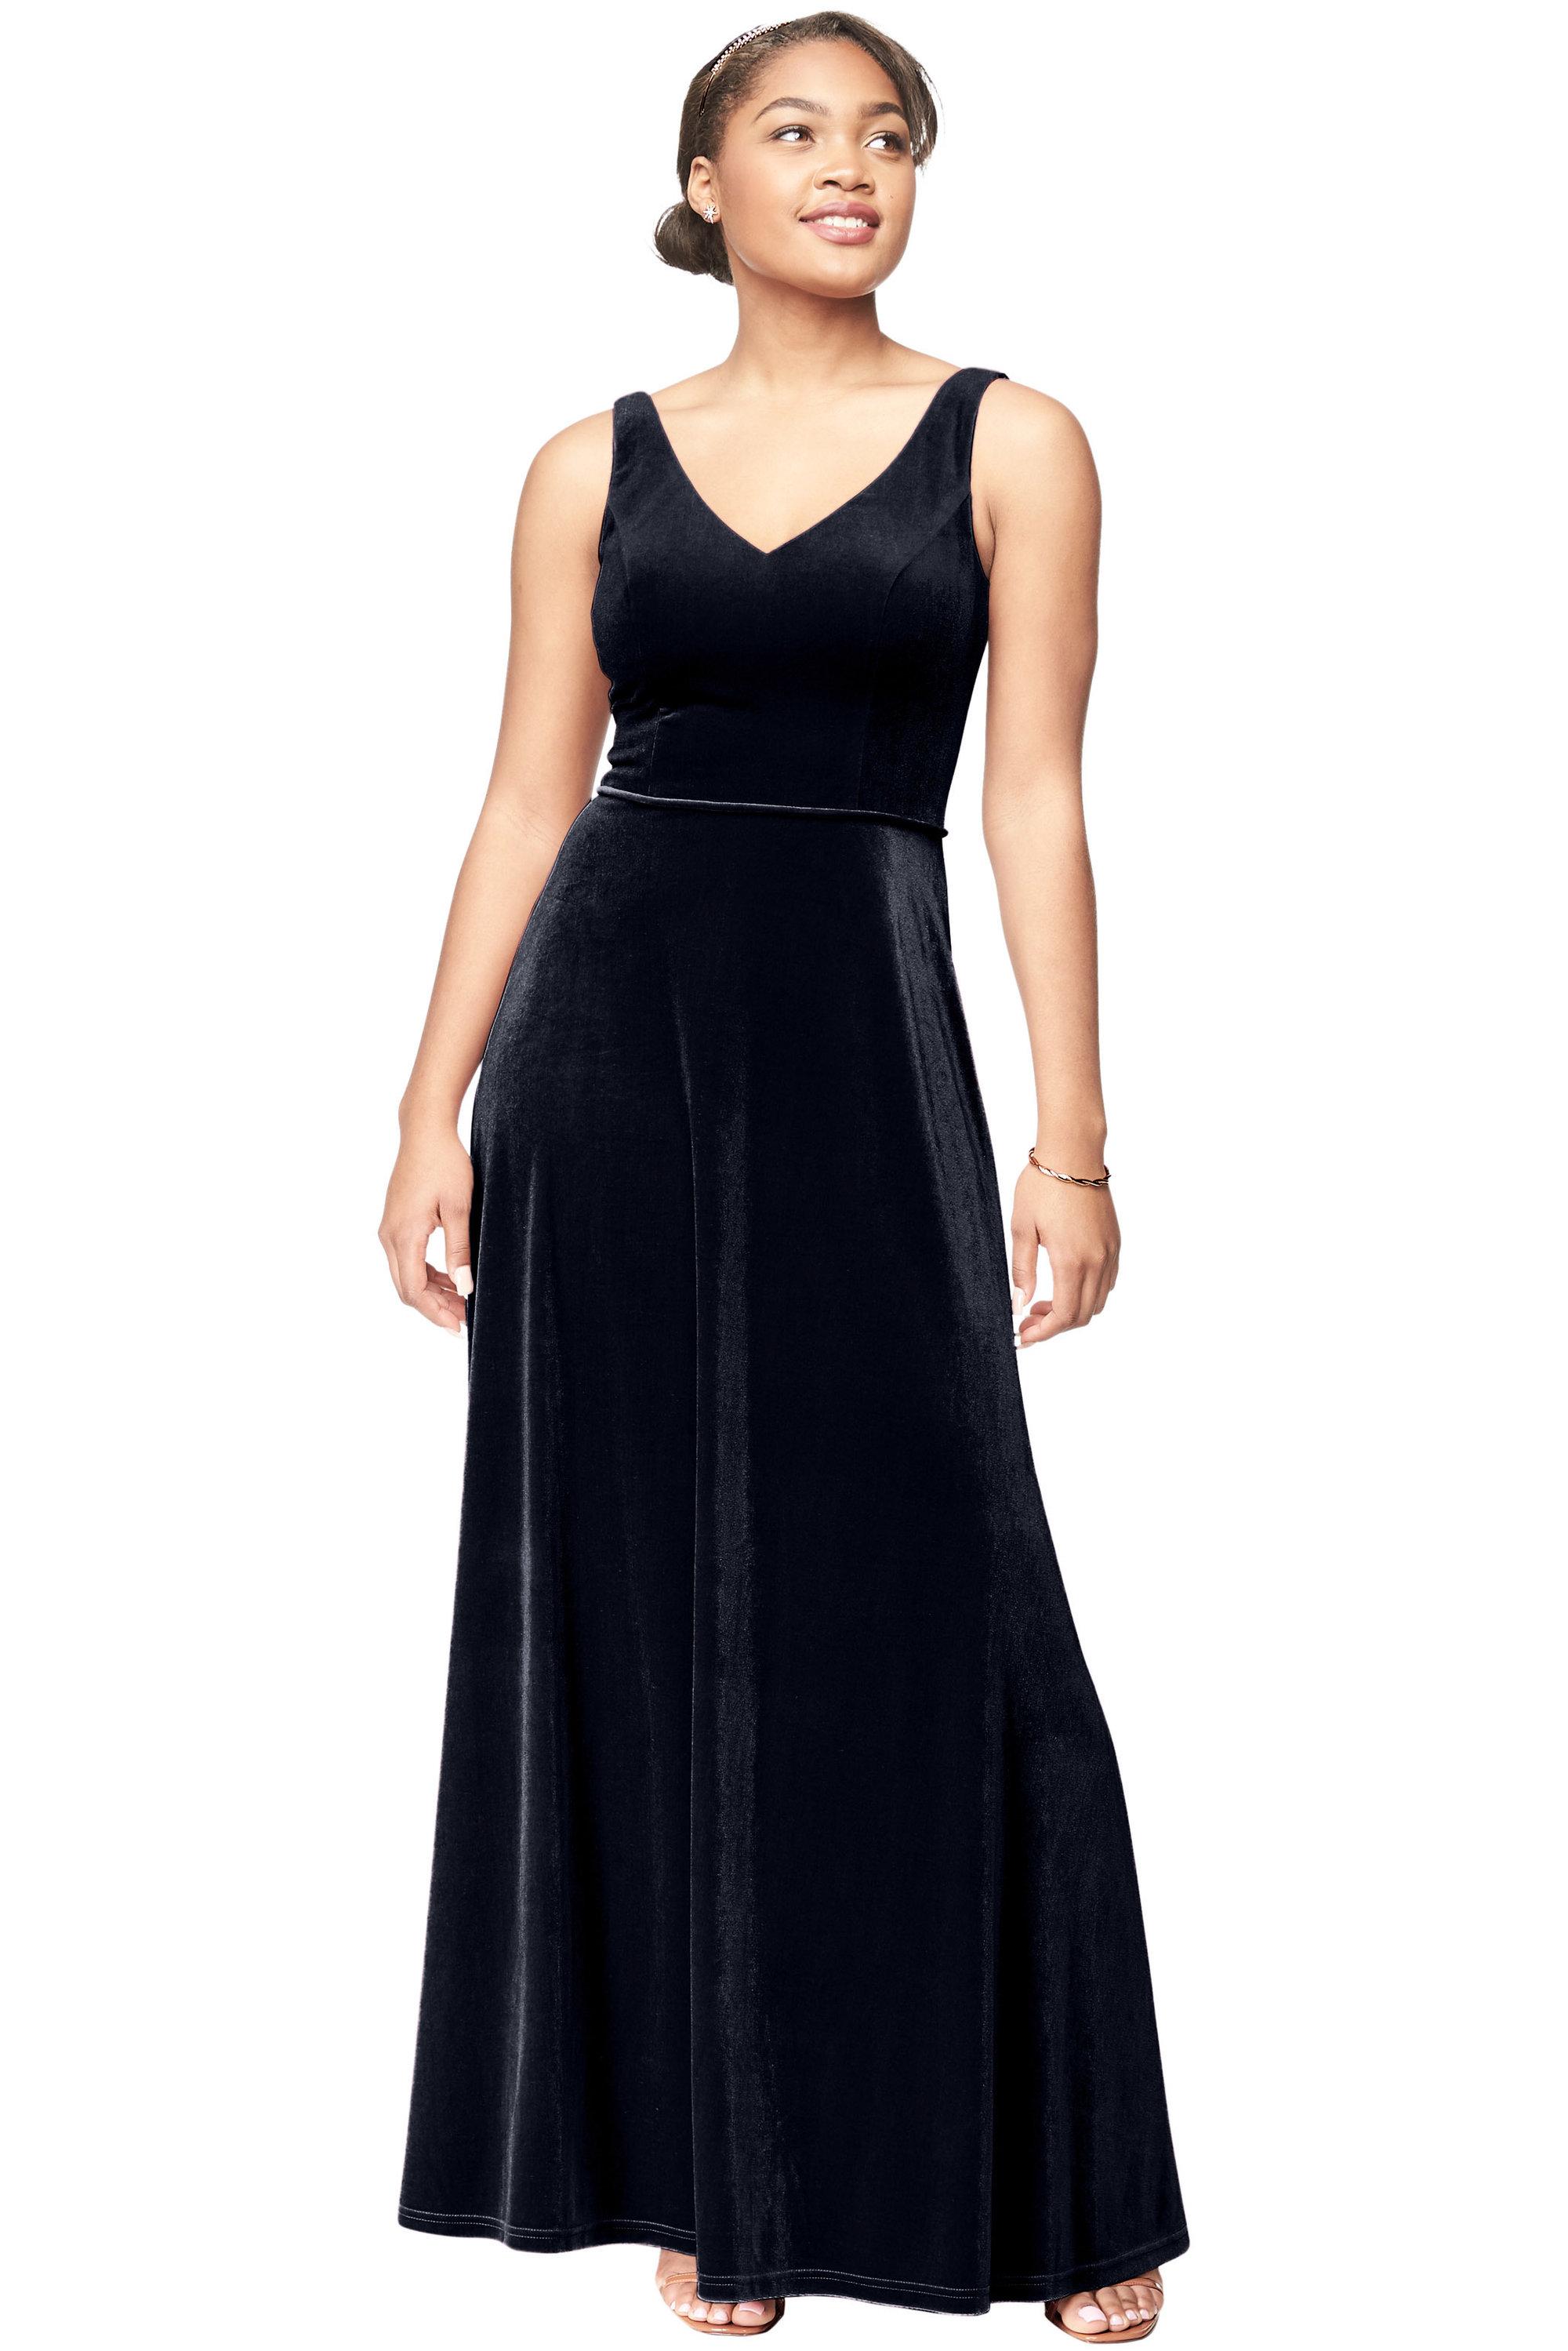 Bill Levkoff MIDNIGHT Stretch Velvet V-Neck A-Line gown, $220.00 Front